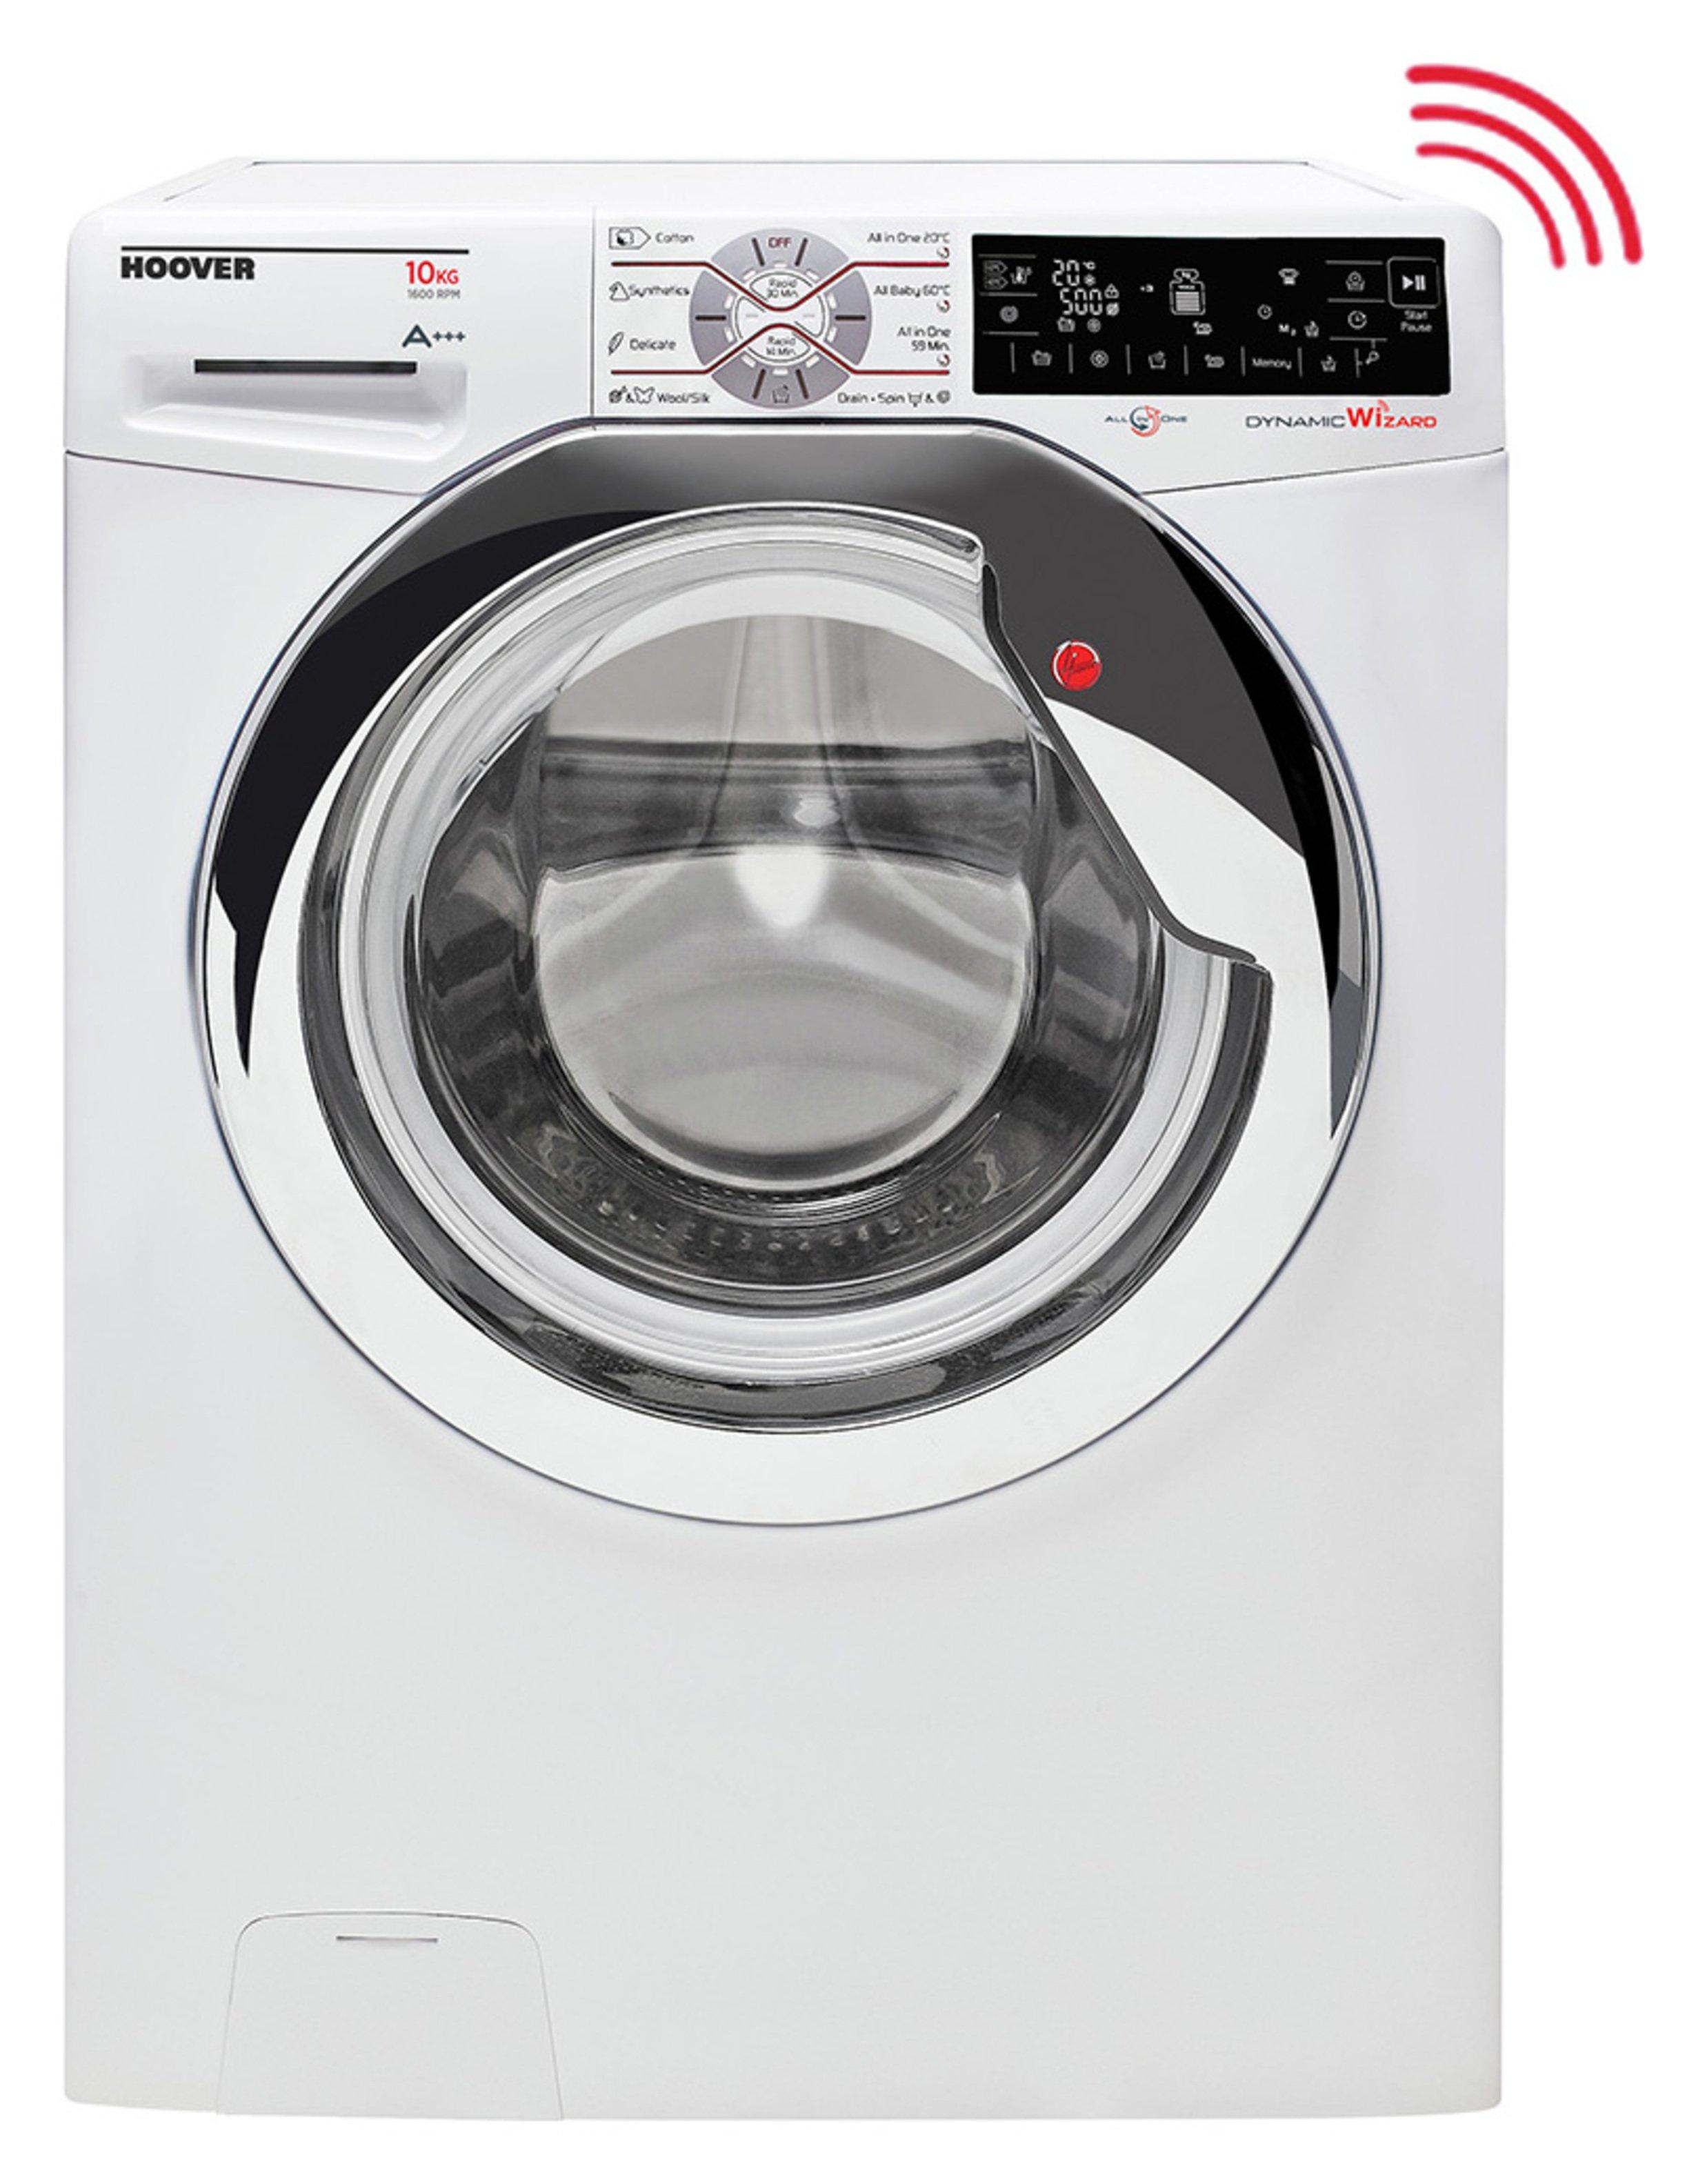 Image of Hoover - Wizard DWTL610AIW3 10KG Wi-Fi - Washing Machine